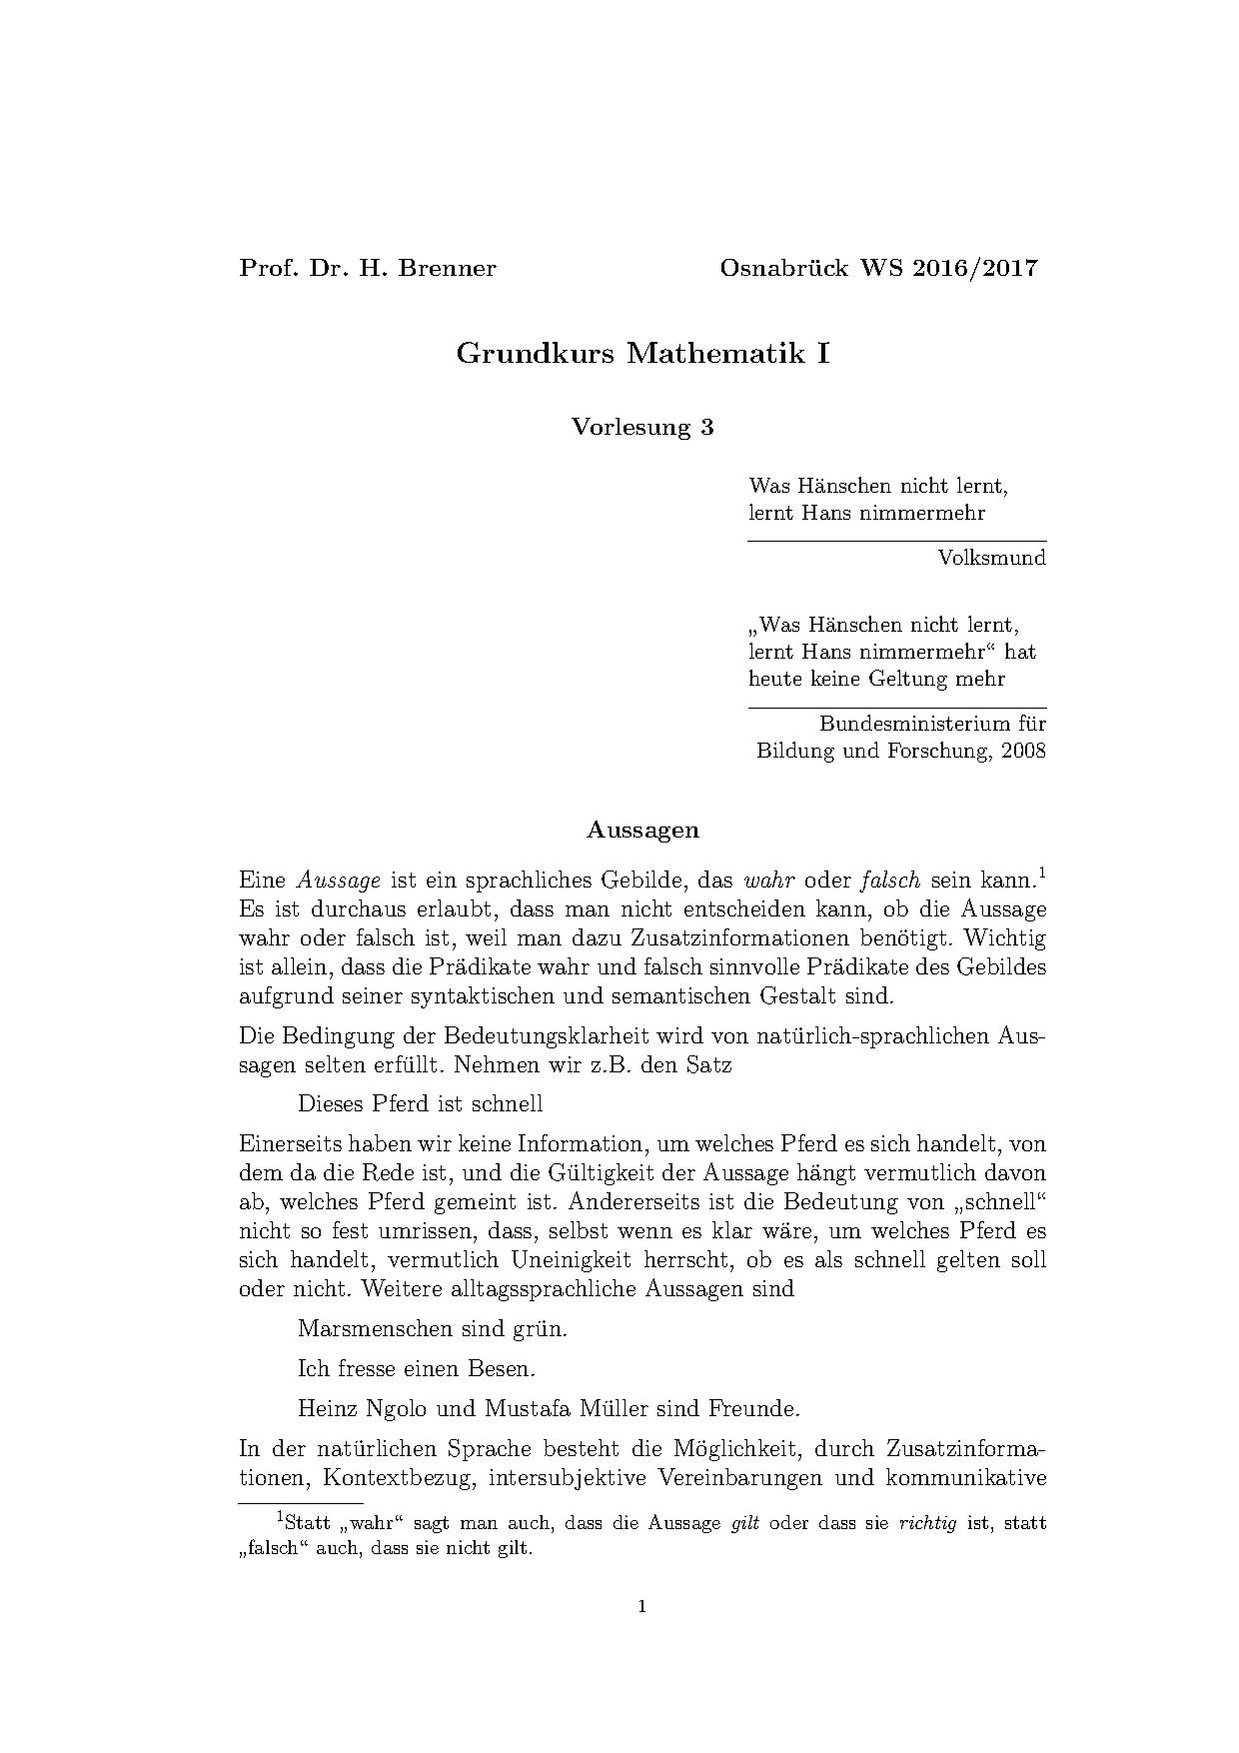 File:Grundkurs Mathematik (Osnabrück 2016-2017)Teil IVorlesung3.pdf ...